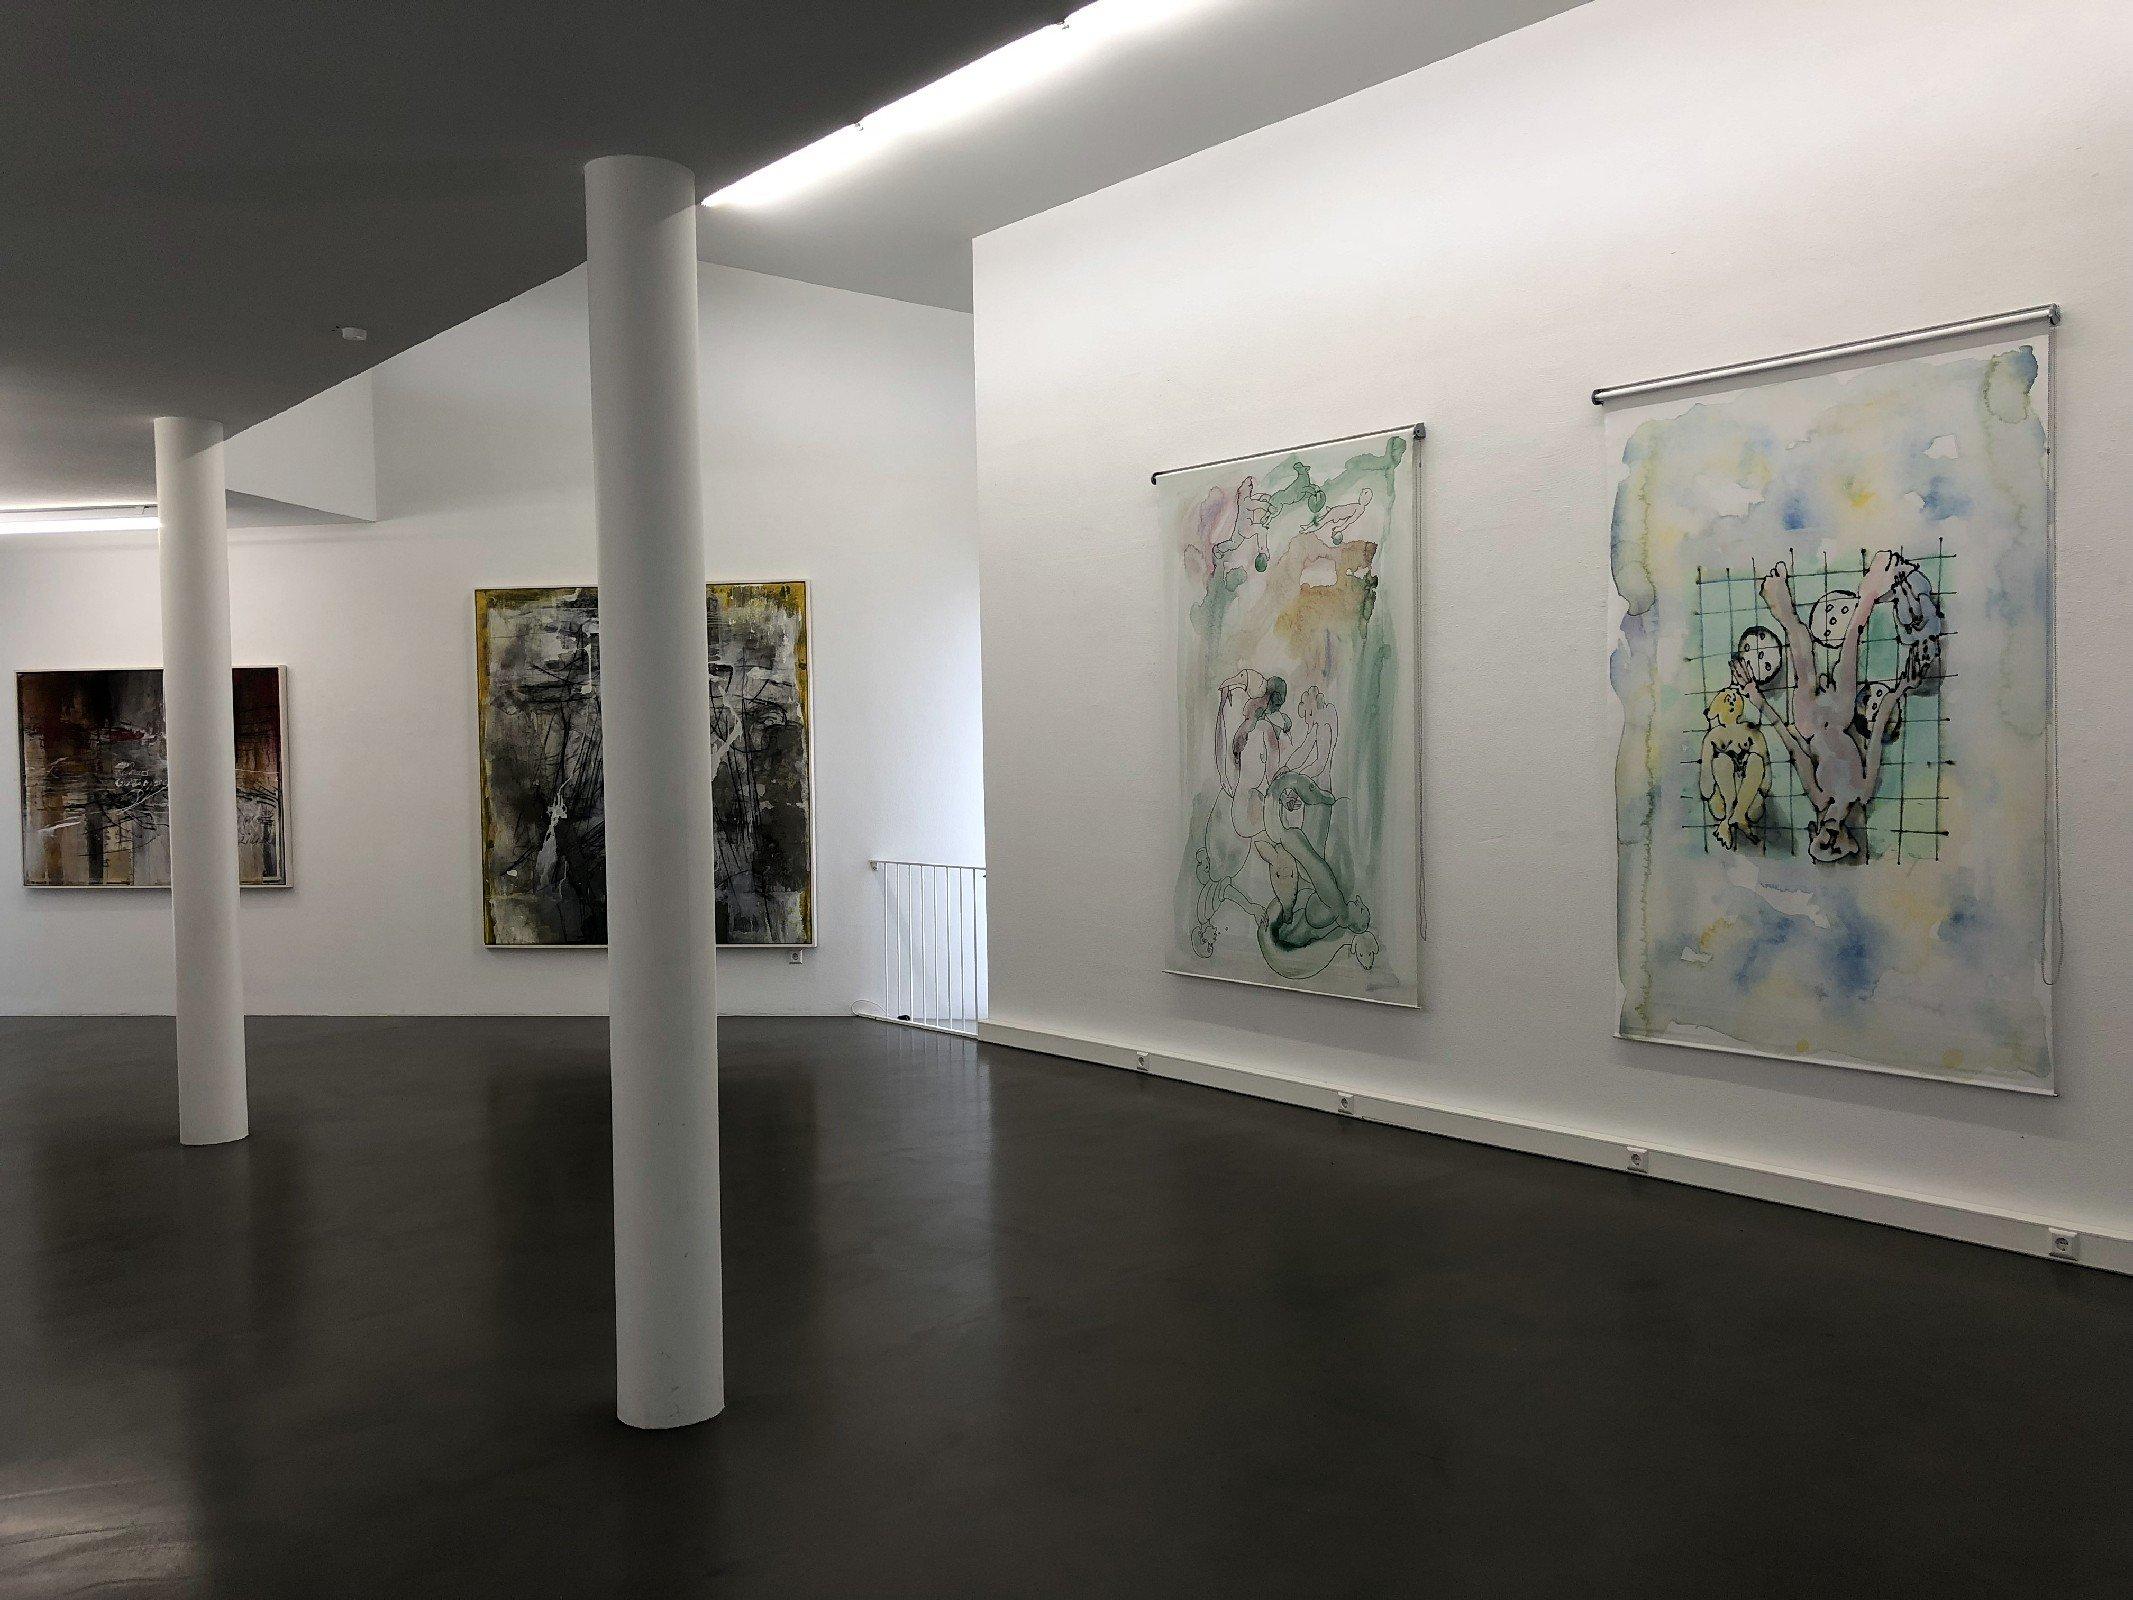 Galerie K in Staufen im Breisgau, Germany by Jets Like Taxis